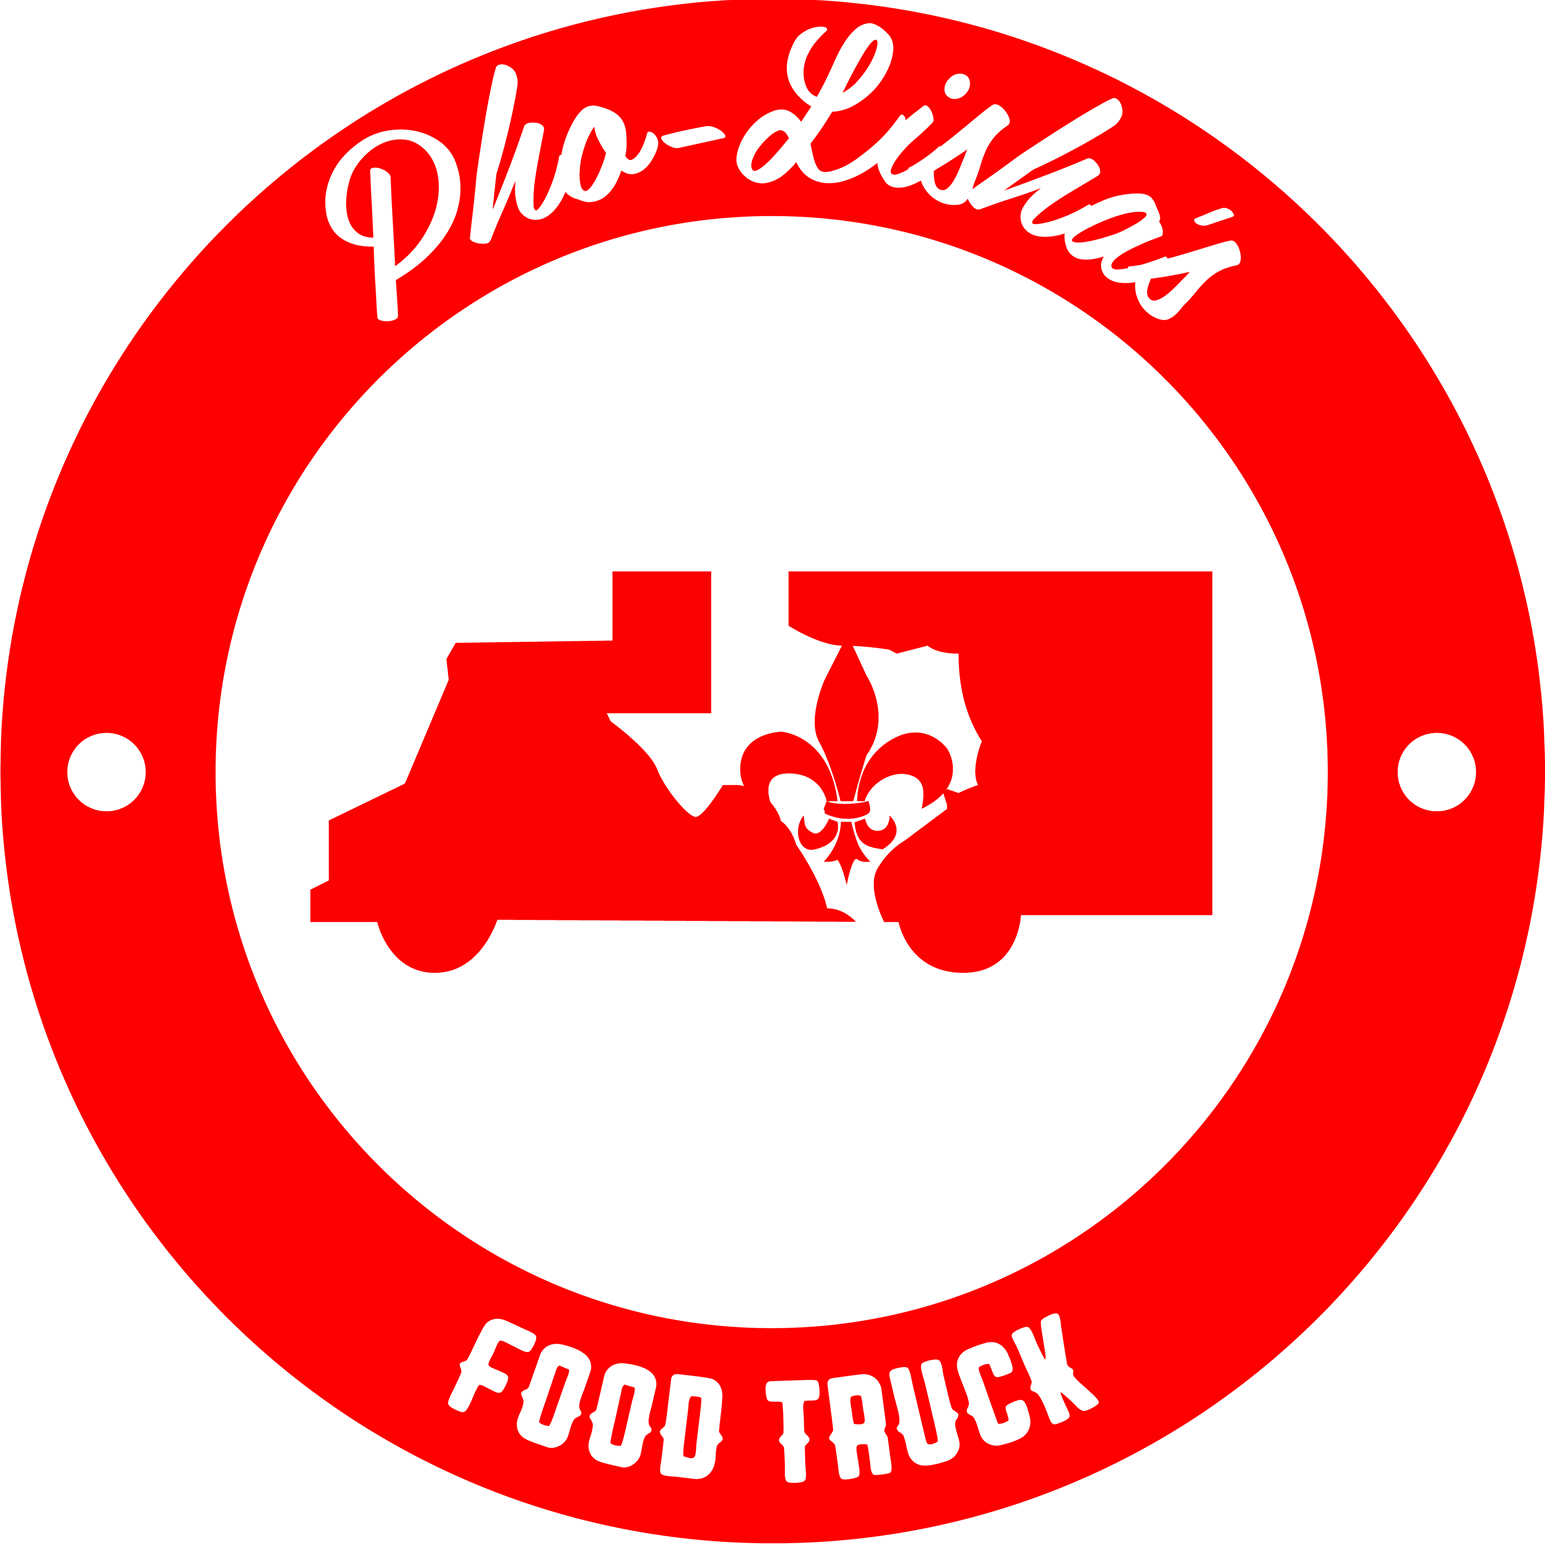 Pho-Lisha's Food Truck logo